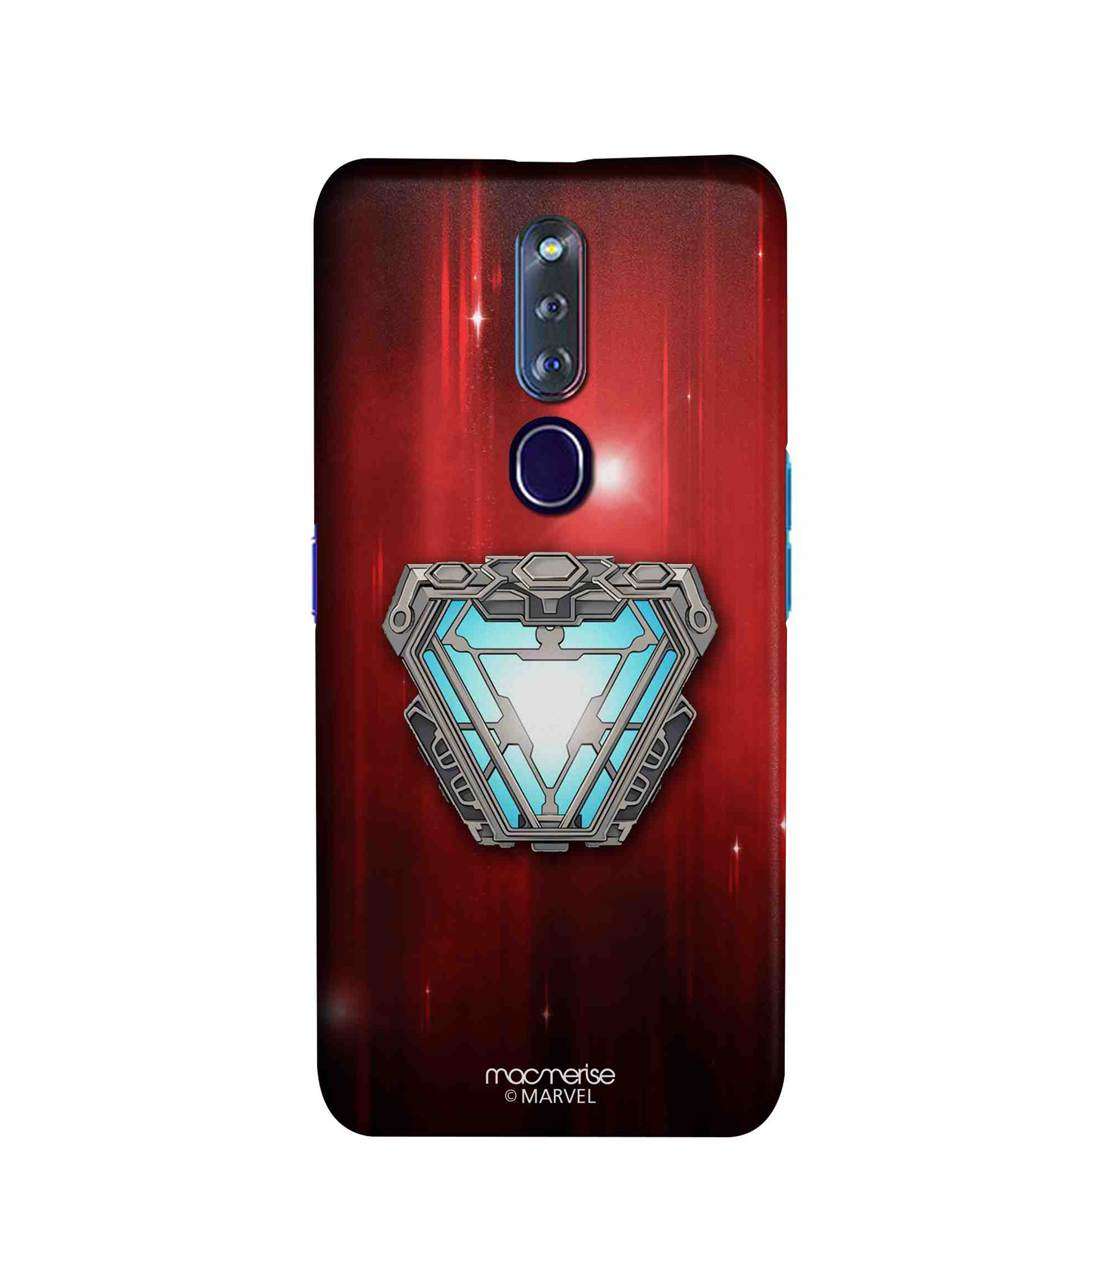 Iron man Infinity Arc Reactor - Sleek Phone Case for Oppo F11 Pro